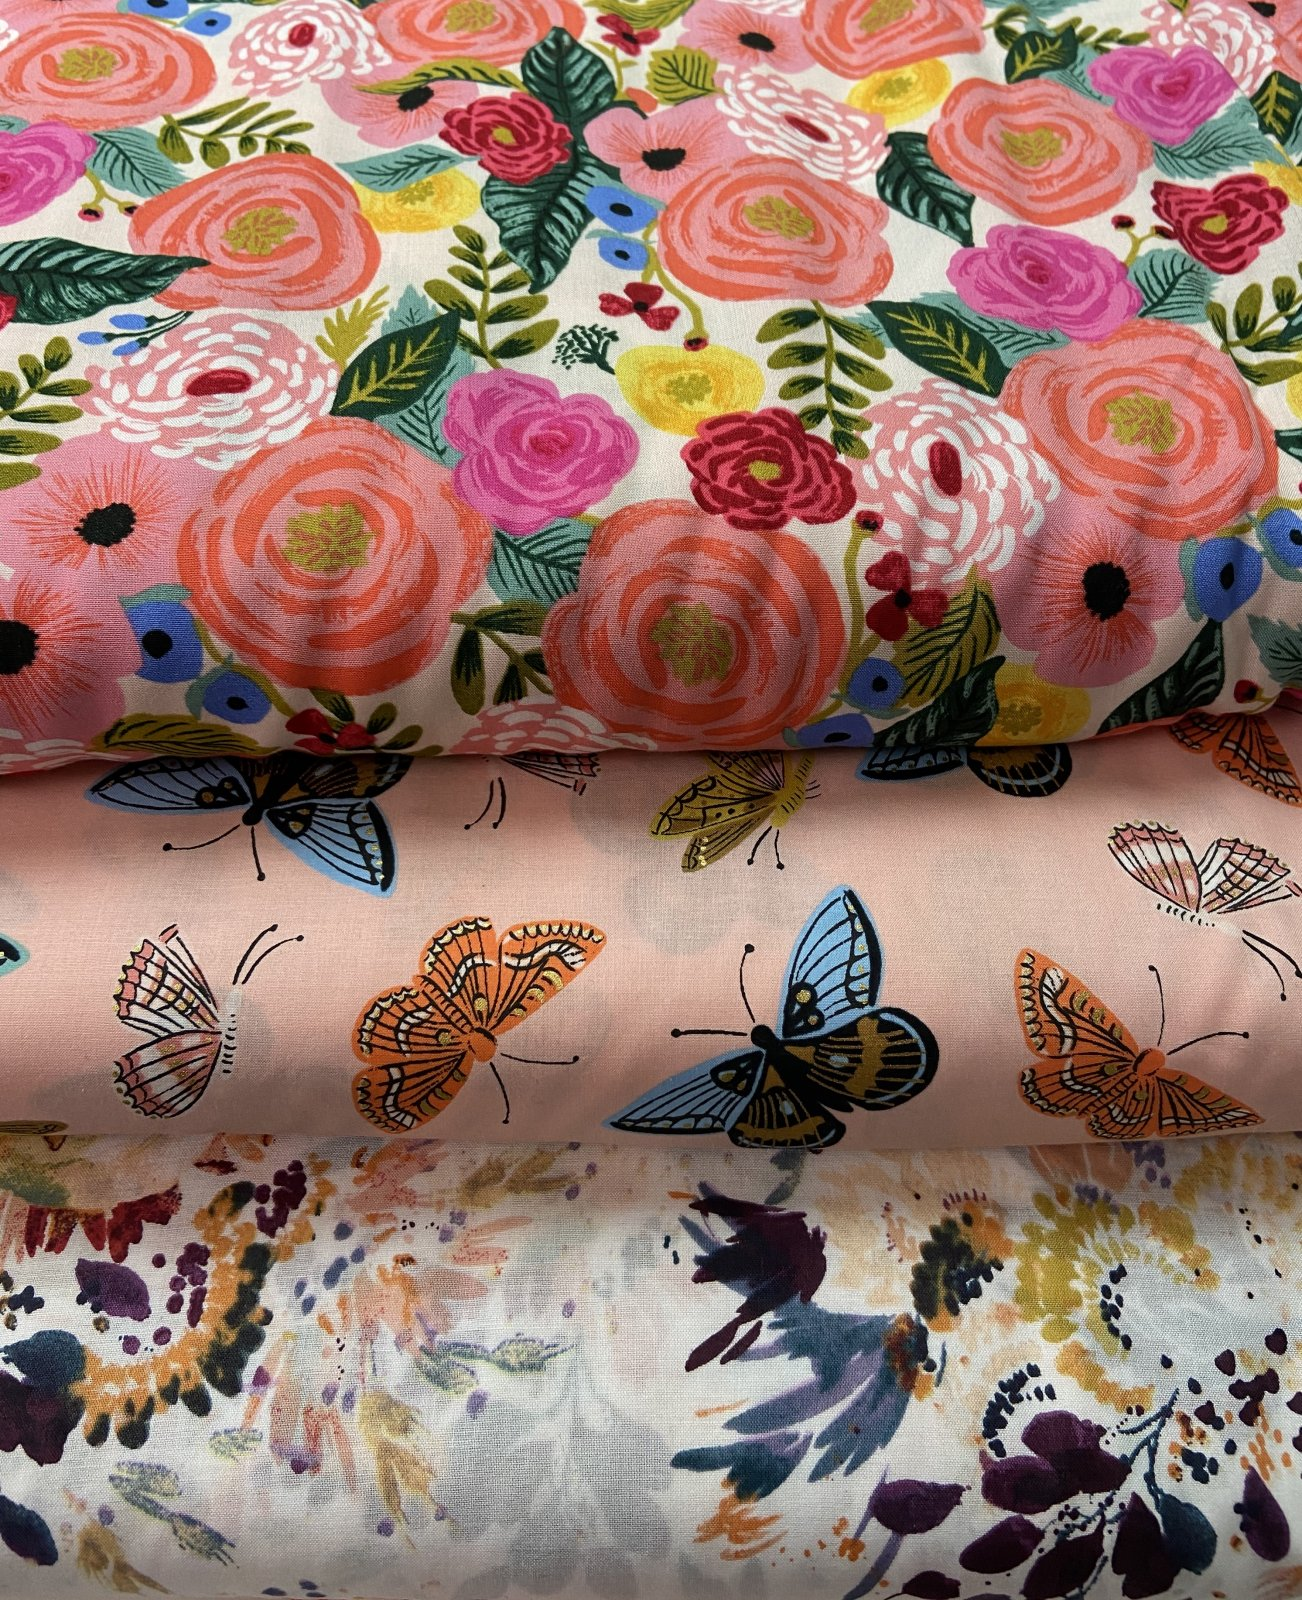 Fresh Cuts Fabric Packs- Cotton Lawn (3x 1 Yd Cuts)